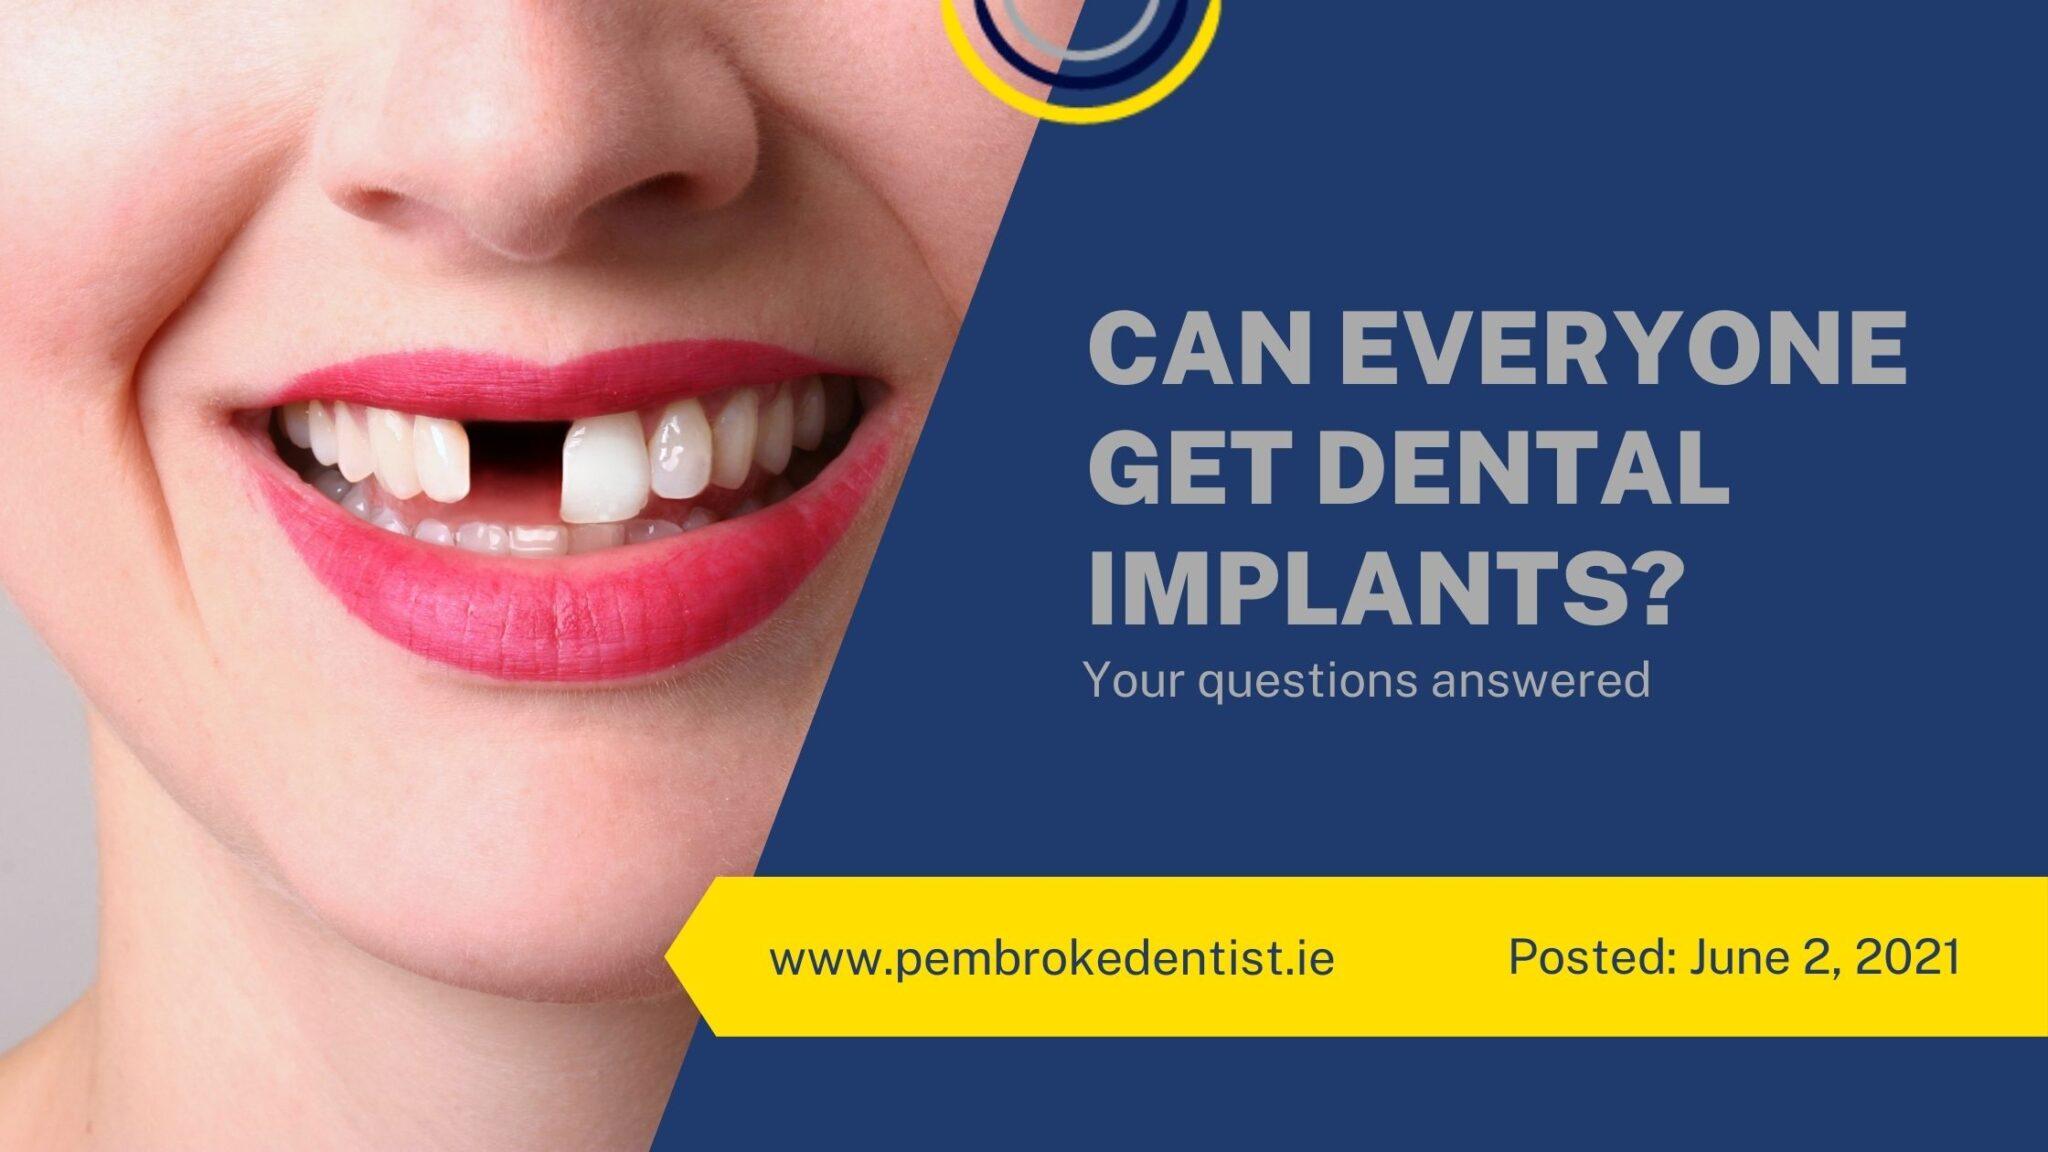 Can Everyone Get Dental Implants